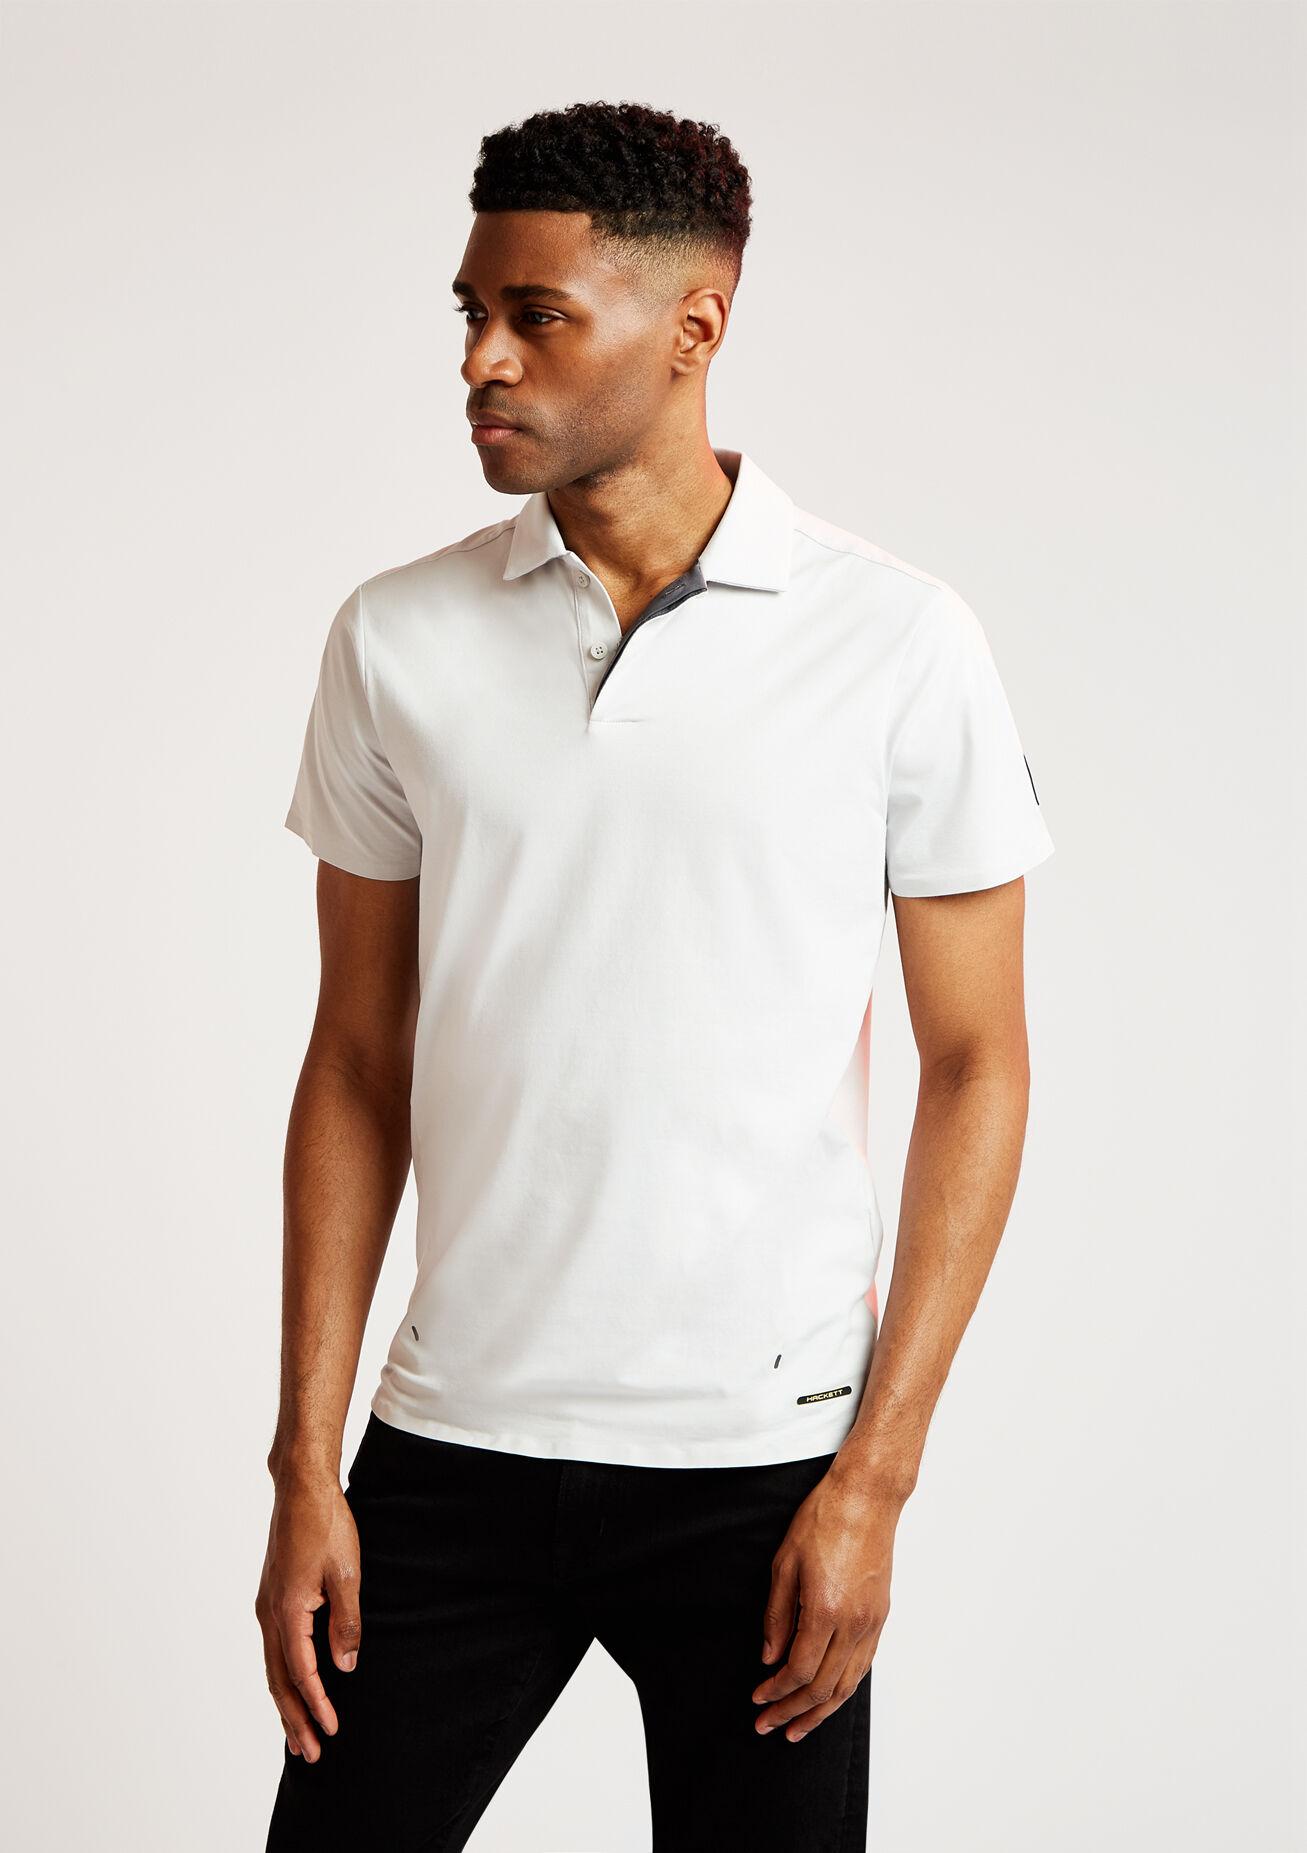 aston martin pro men's jersey polo cotton shirt | large | antarctica